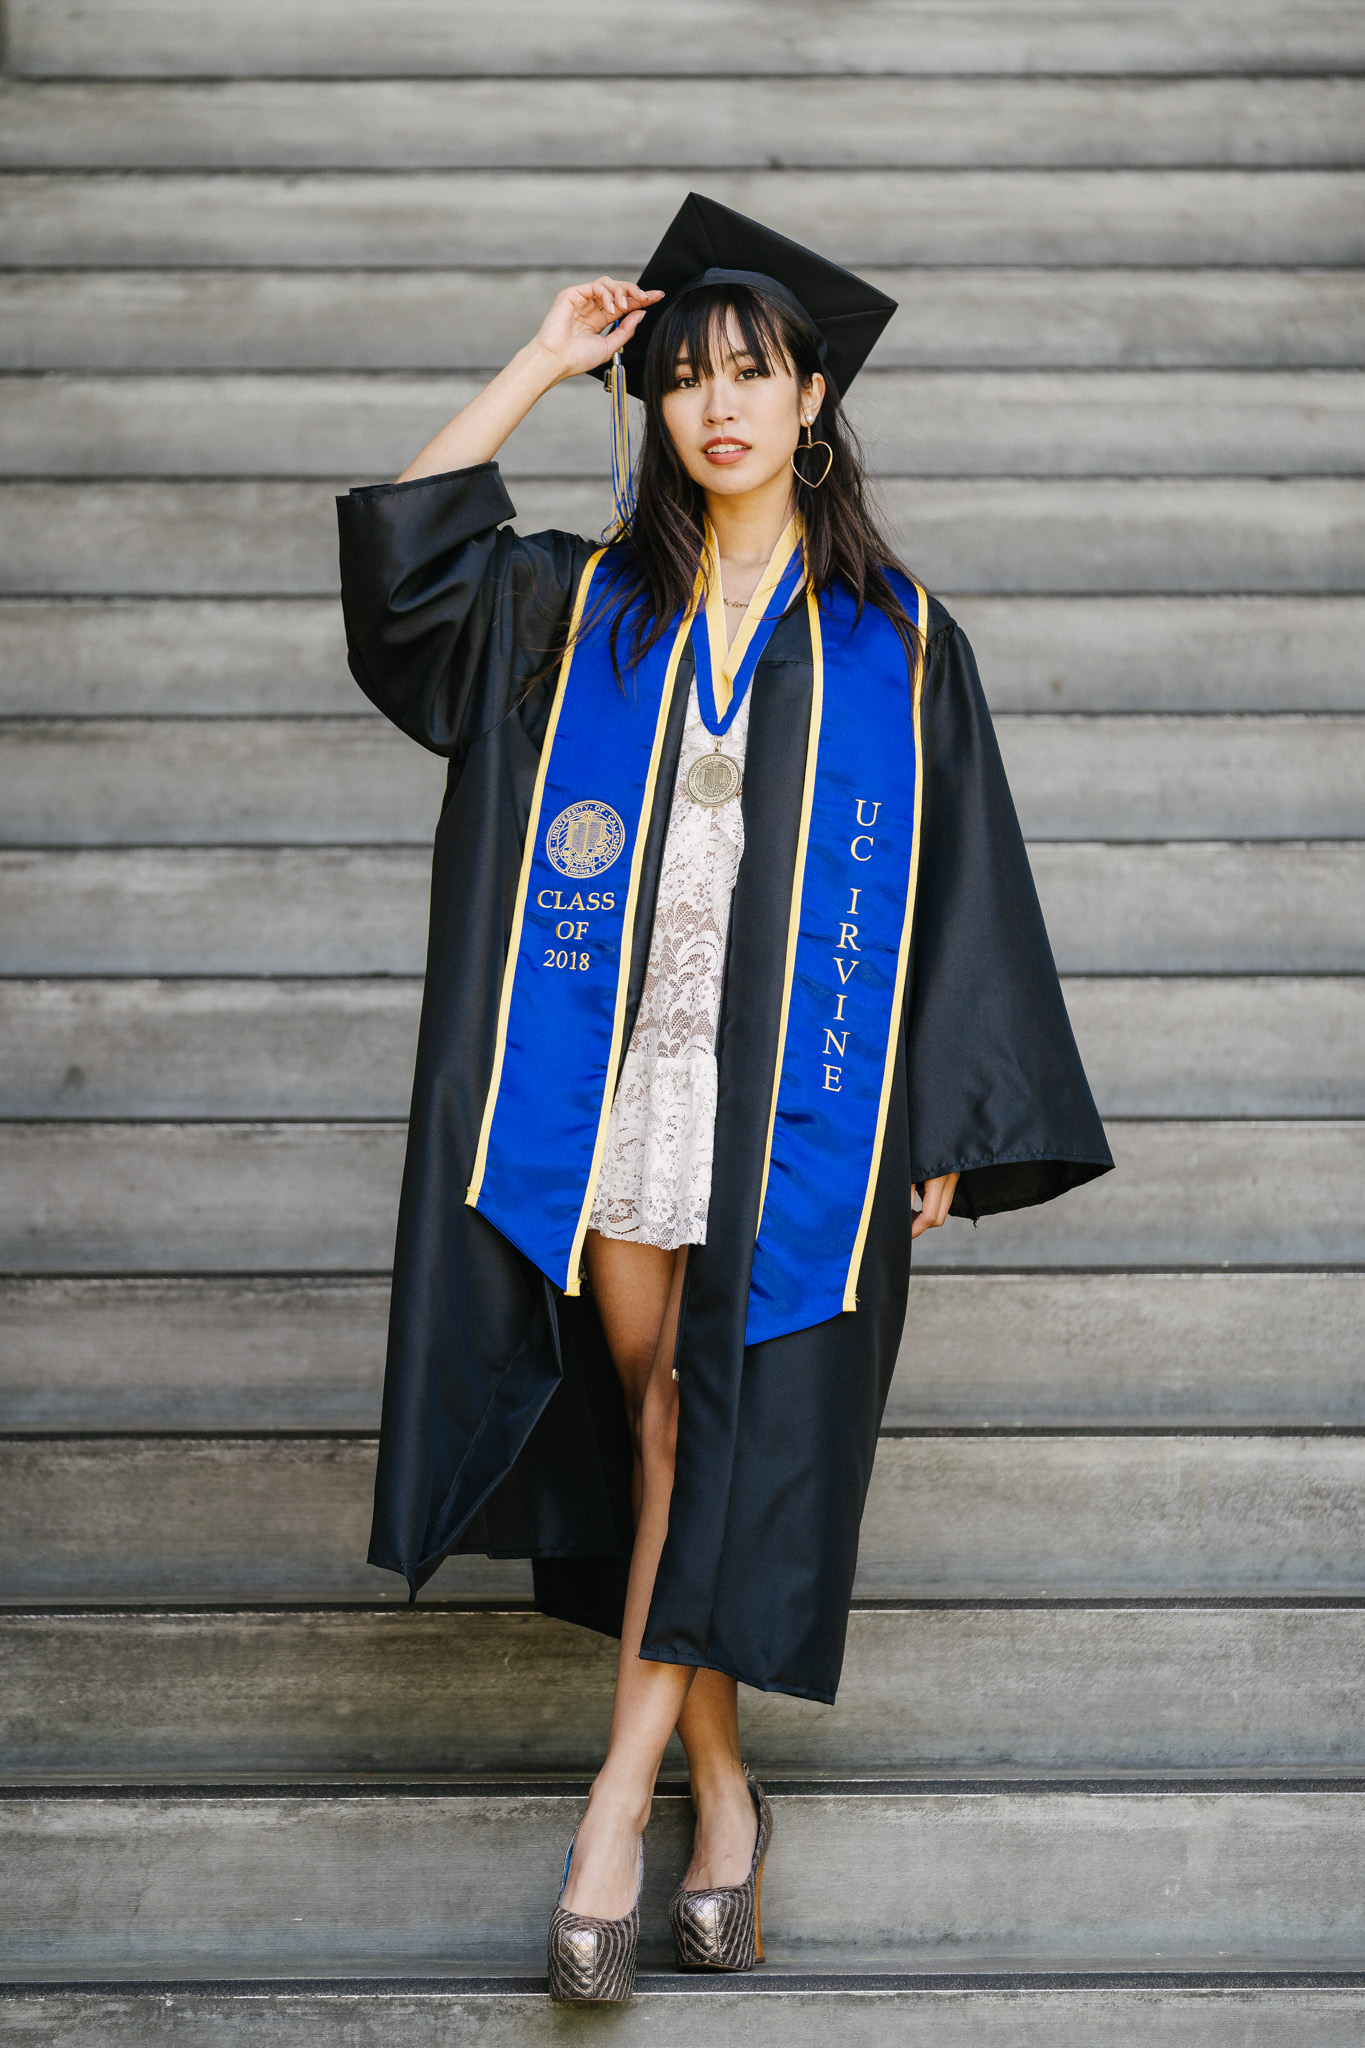 [5-16-2018] Vi's Graduation Photoshoot115.jpg